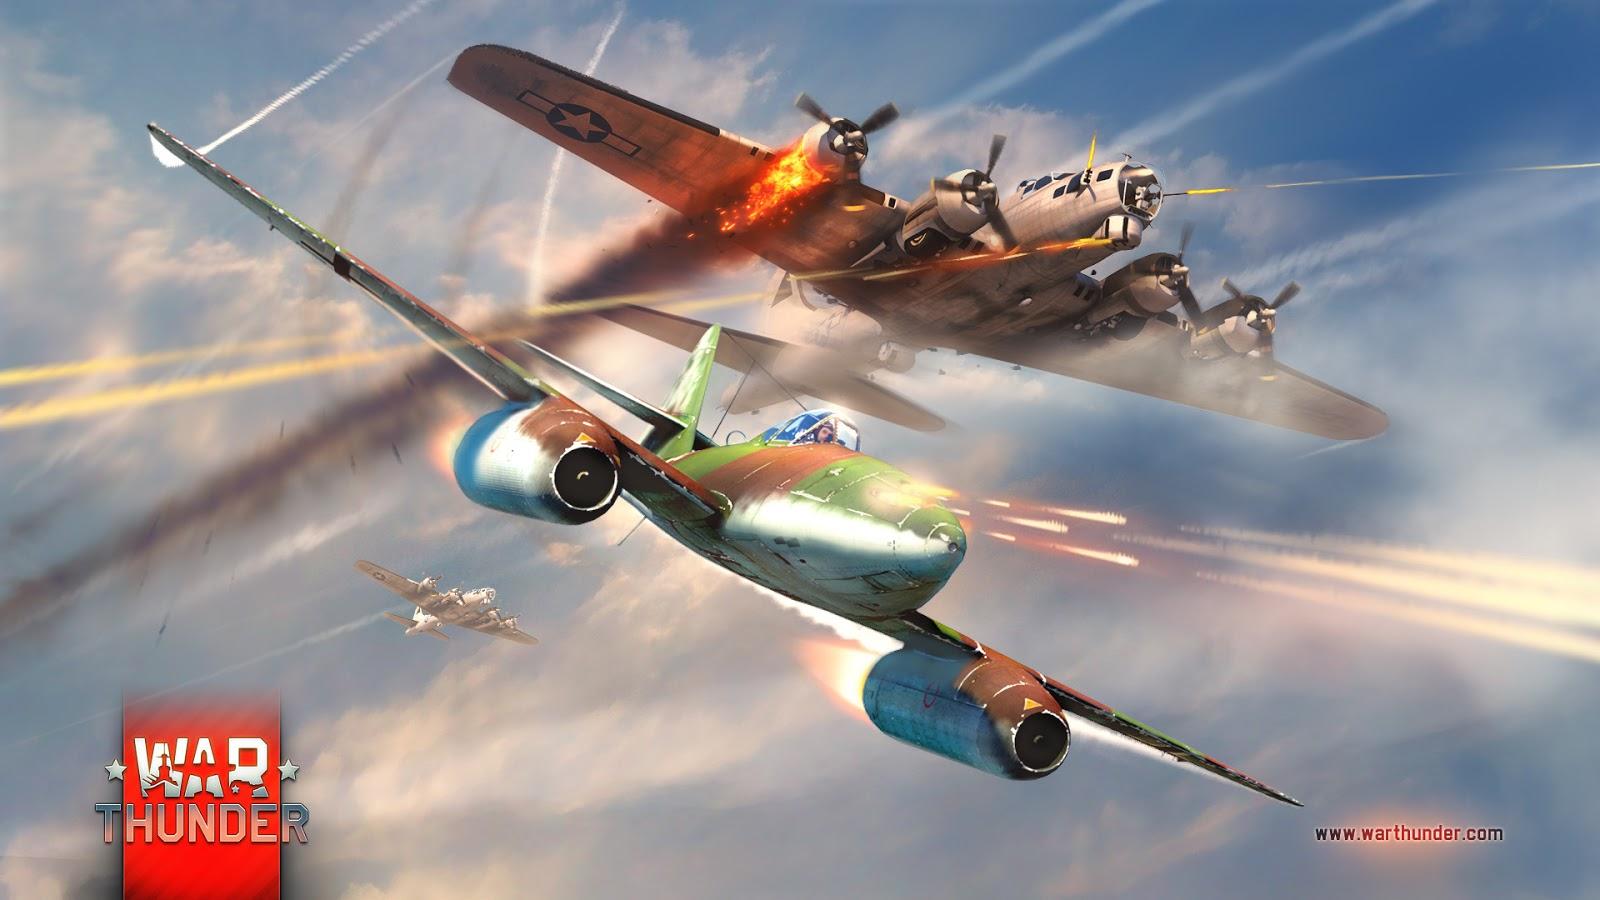 War Thunder Wallpapers   hdrWalls